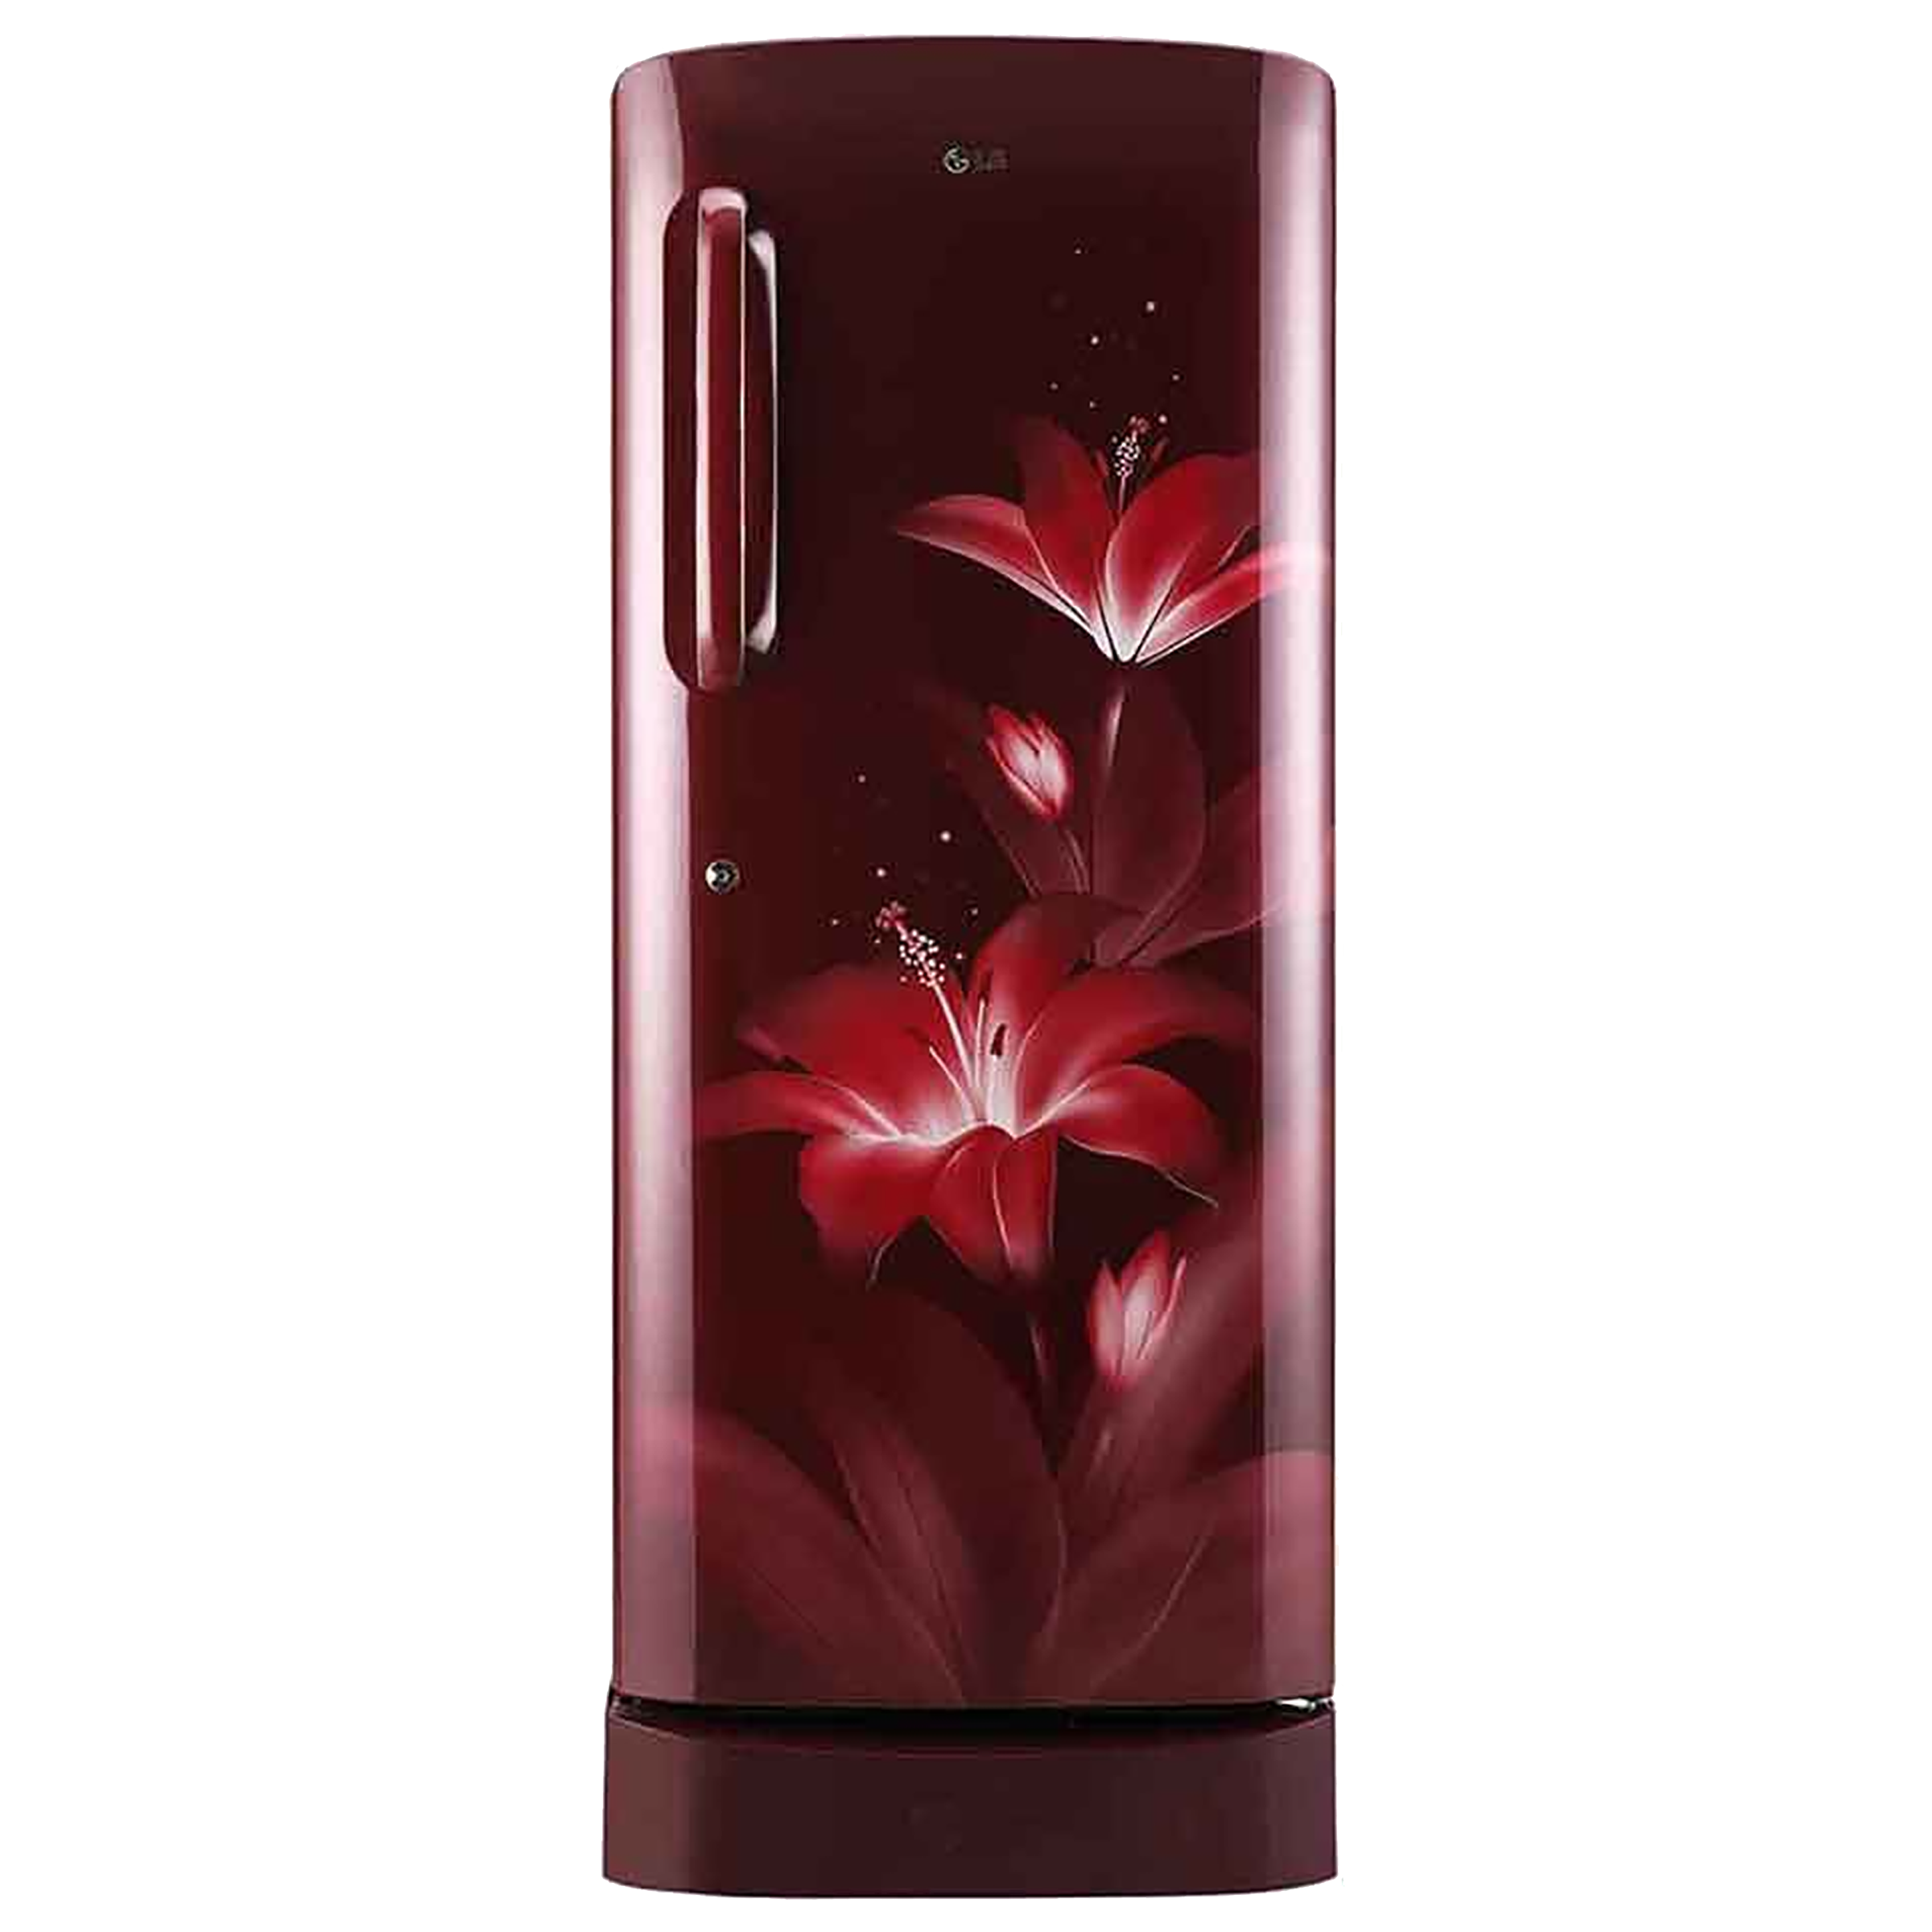 LG 235 Litres 4 Star Direct Cool Inverter Single Door Refrigerator (Toughened Glass Shelves, GL-D241ARGY, Ruby Glow)_1